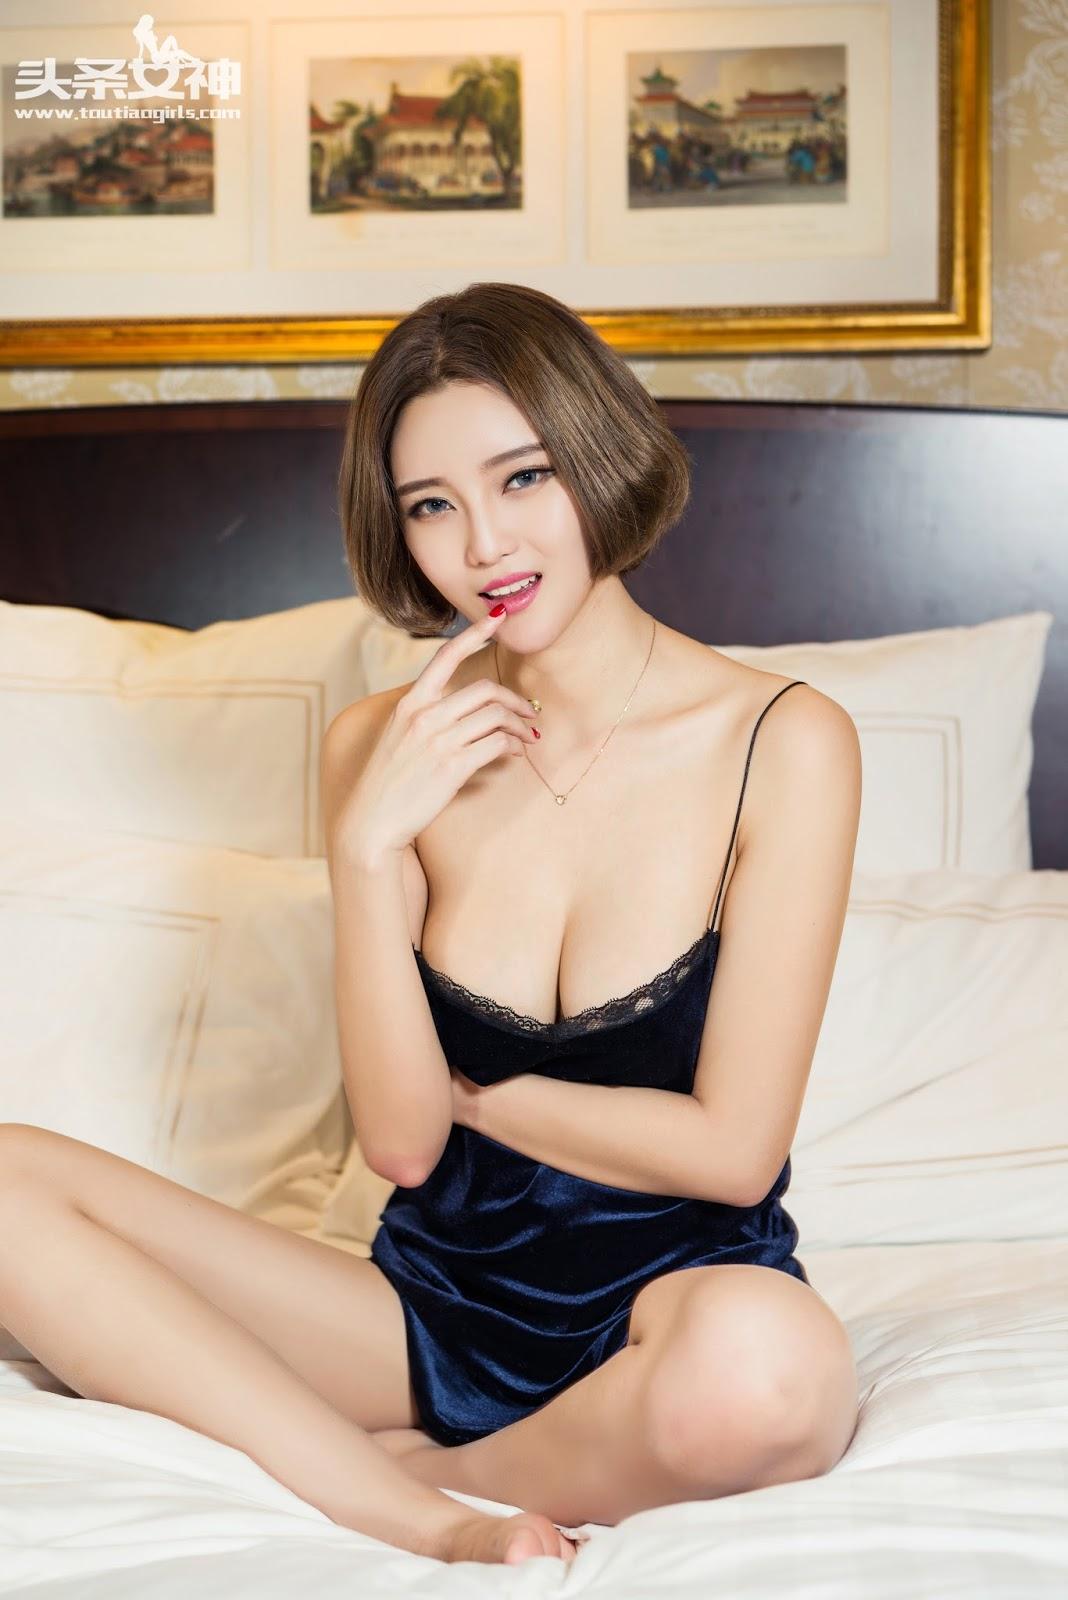 image Xia xinyu chinese model in photo studio